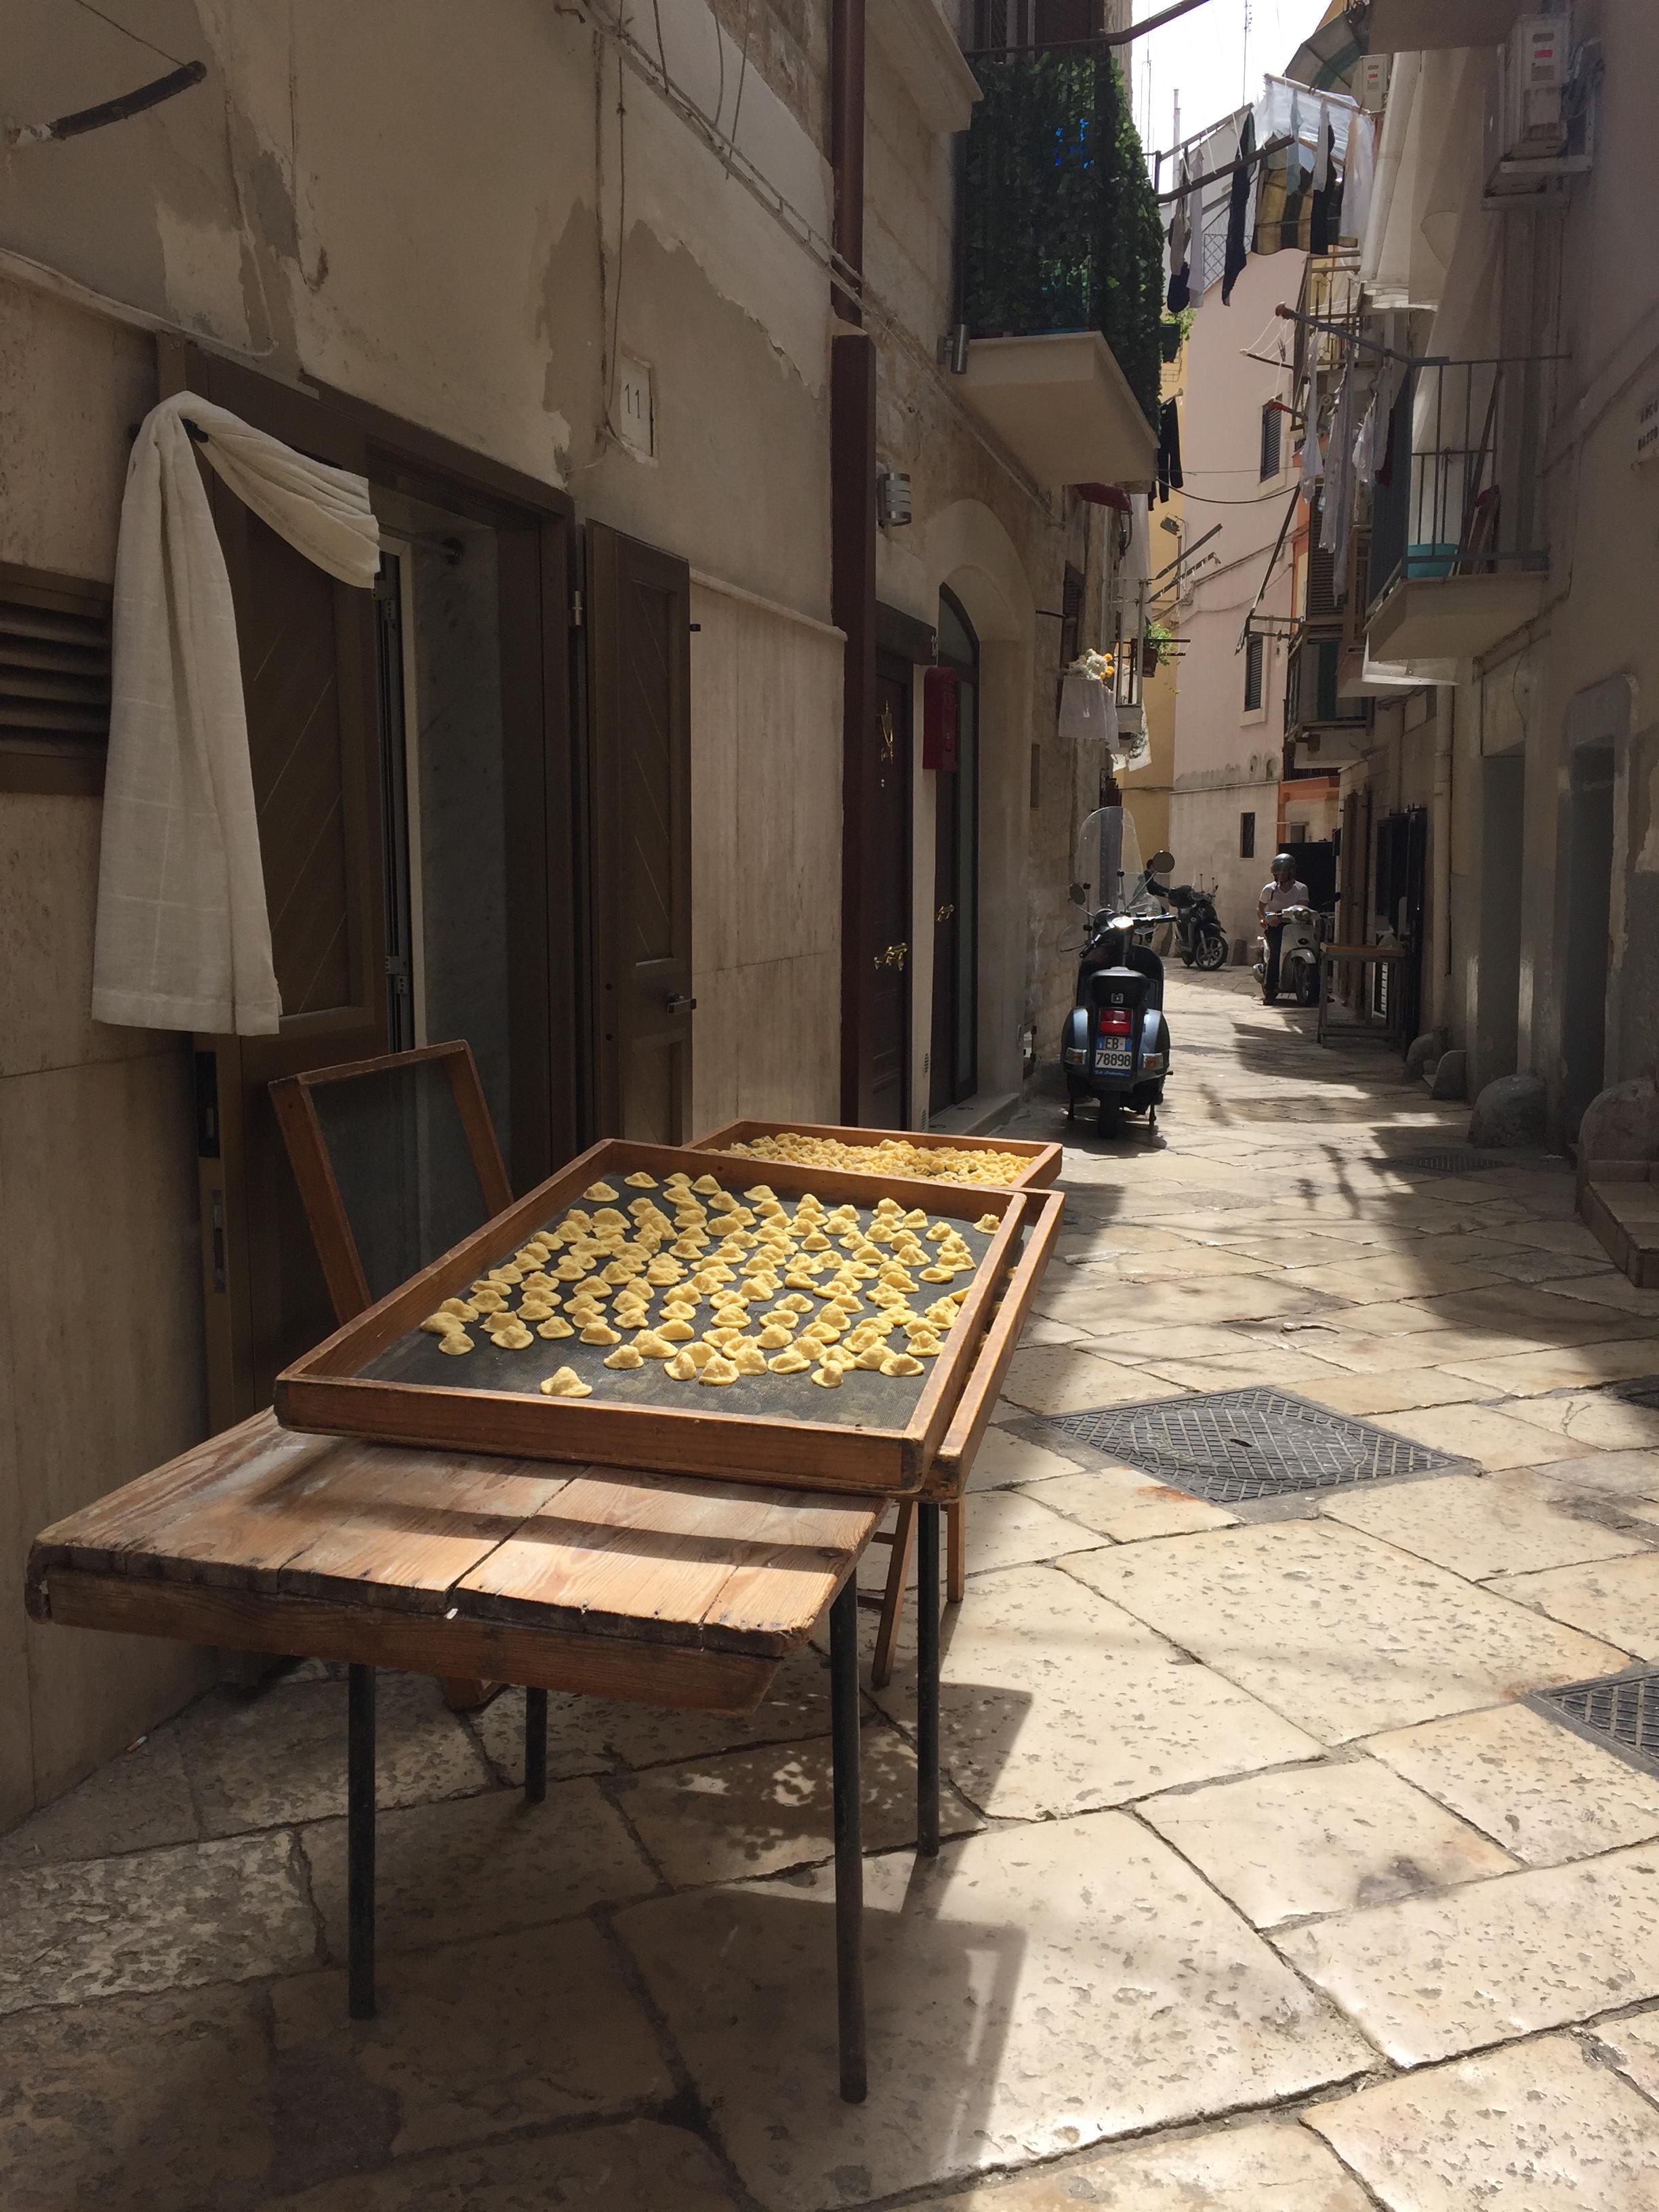 Het orecchiette-straatje in Bari, Puglia